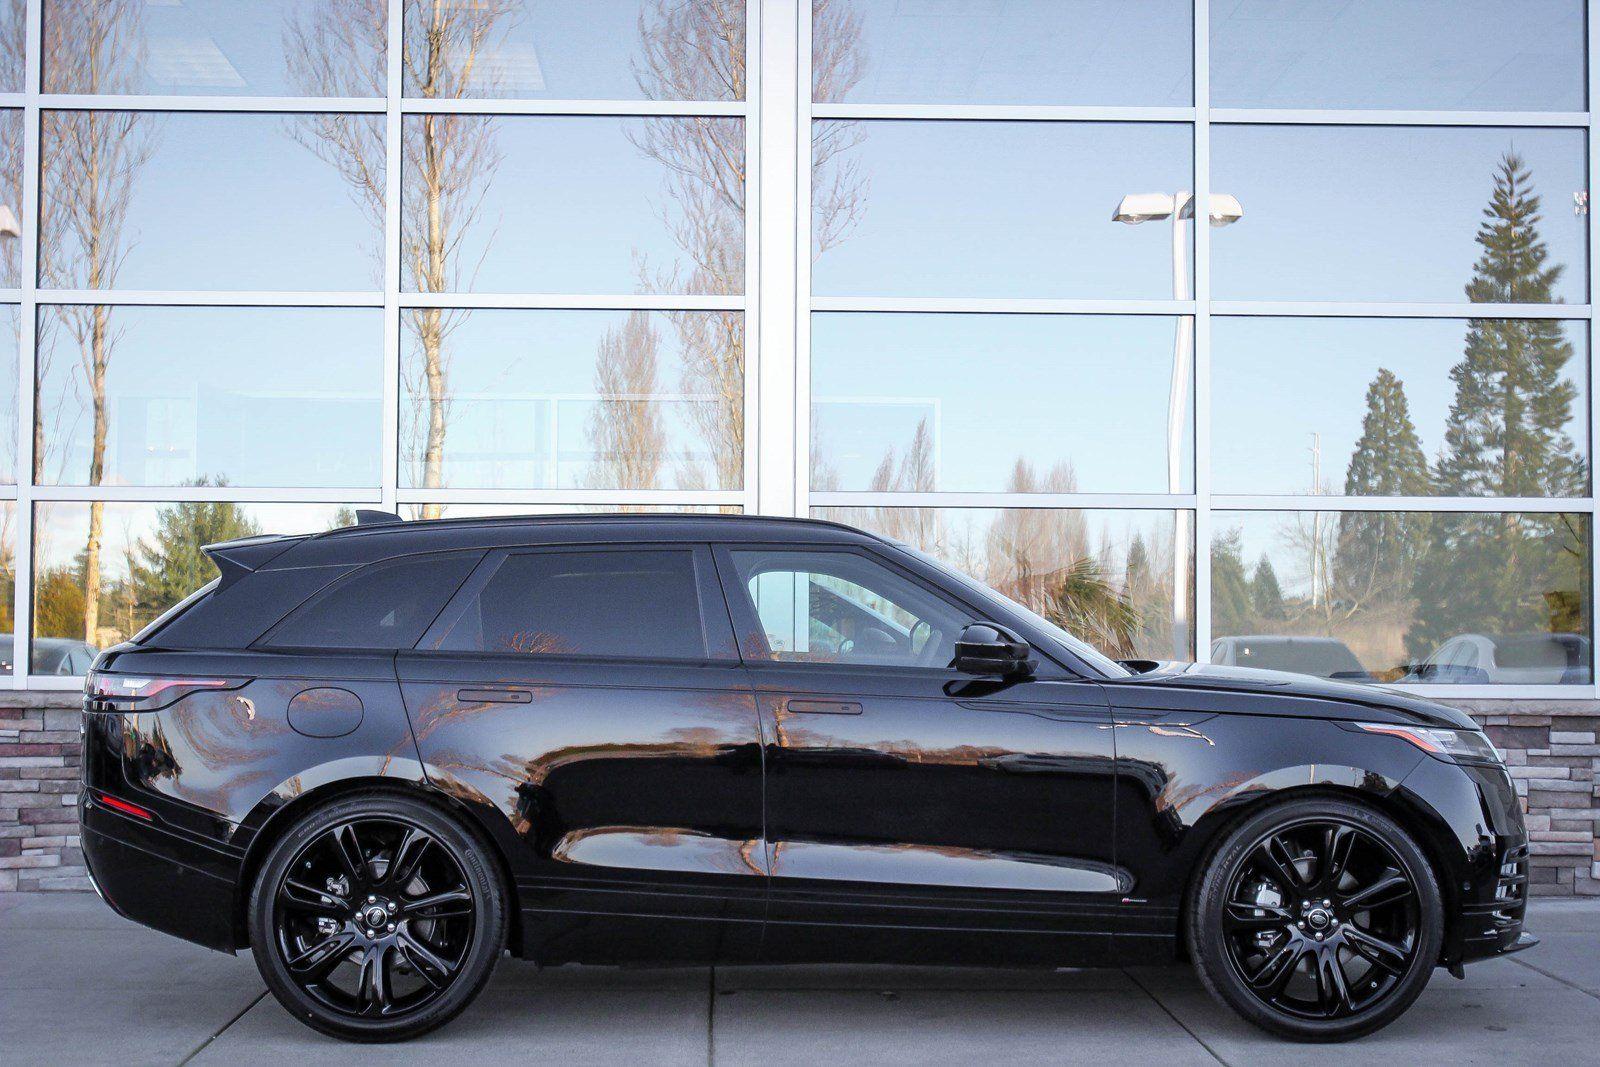 75 New Suvs In Stock Edmonds Land Rover Seattle Range Rover Black Land Rover Range Rover